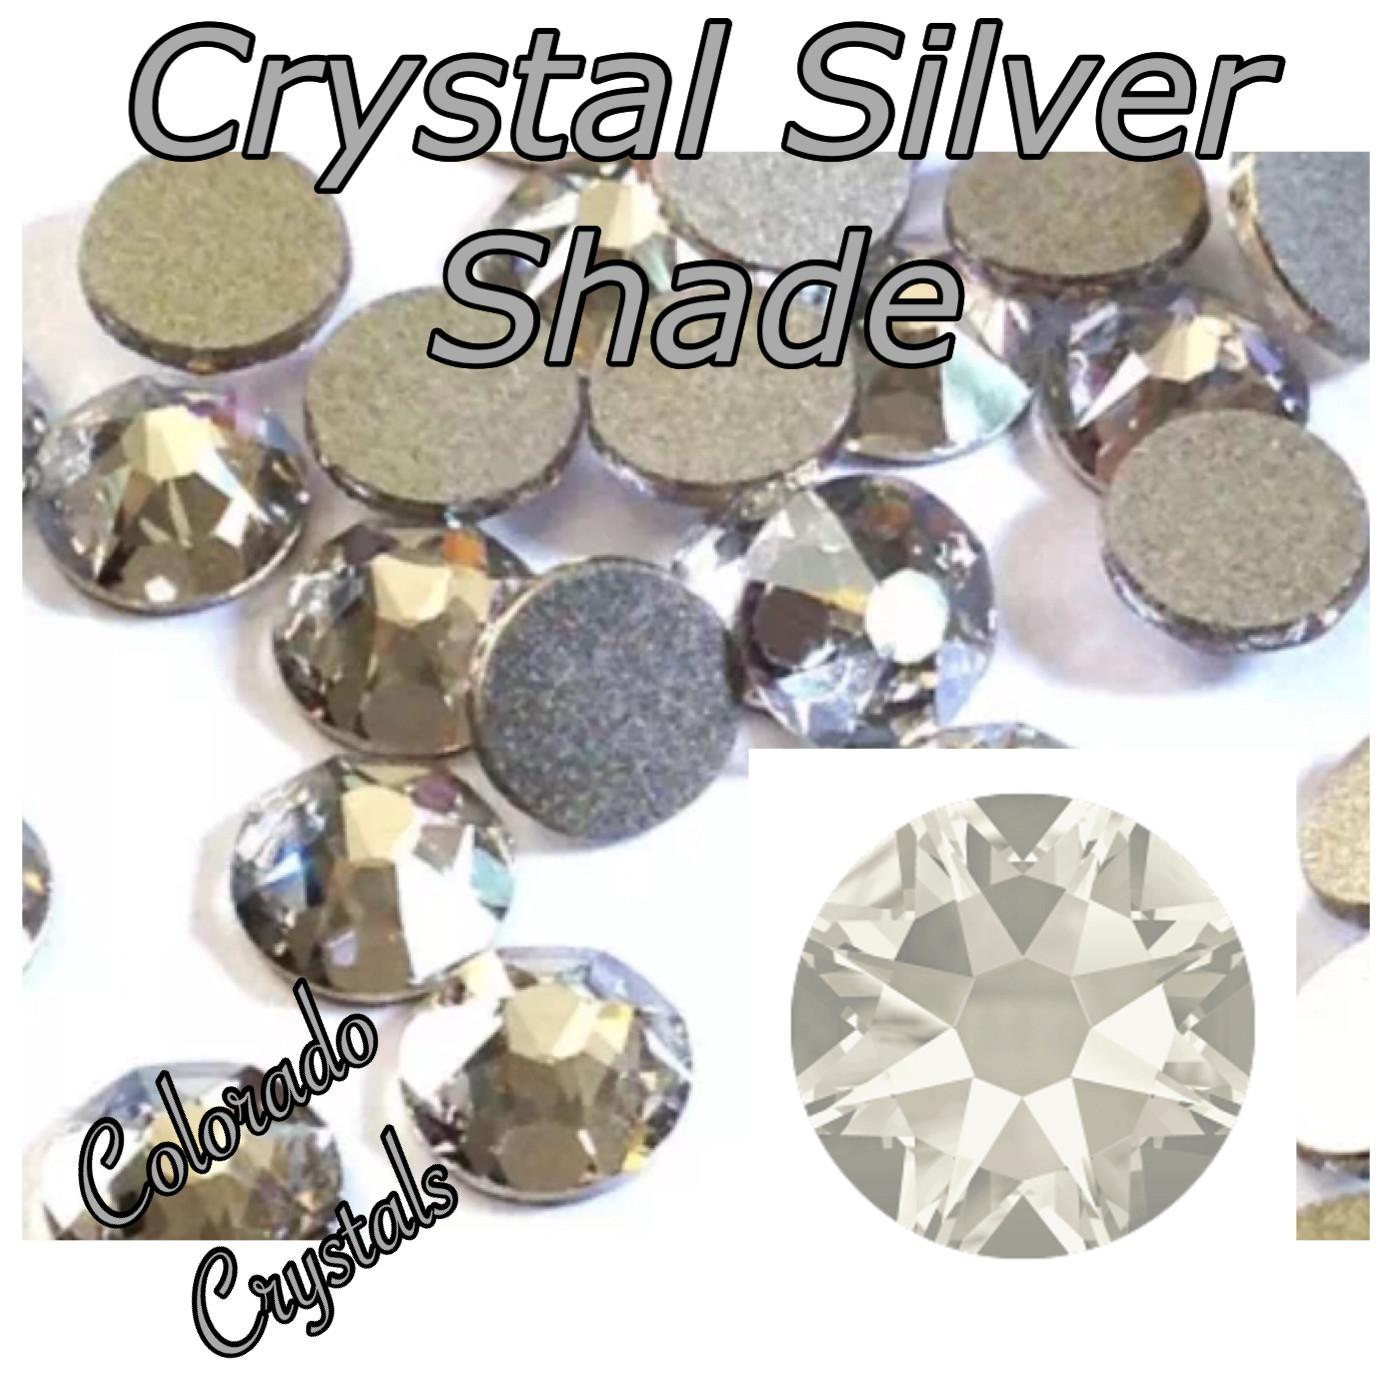 Silver Shade (Crystal) 16ss 2088 Limited Swarovski